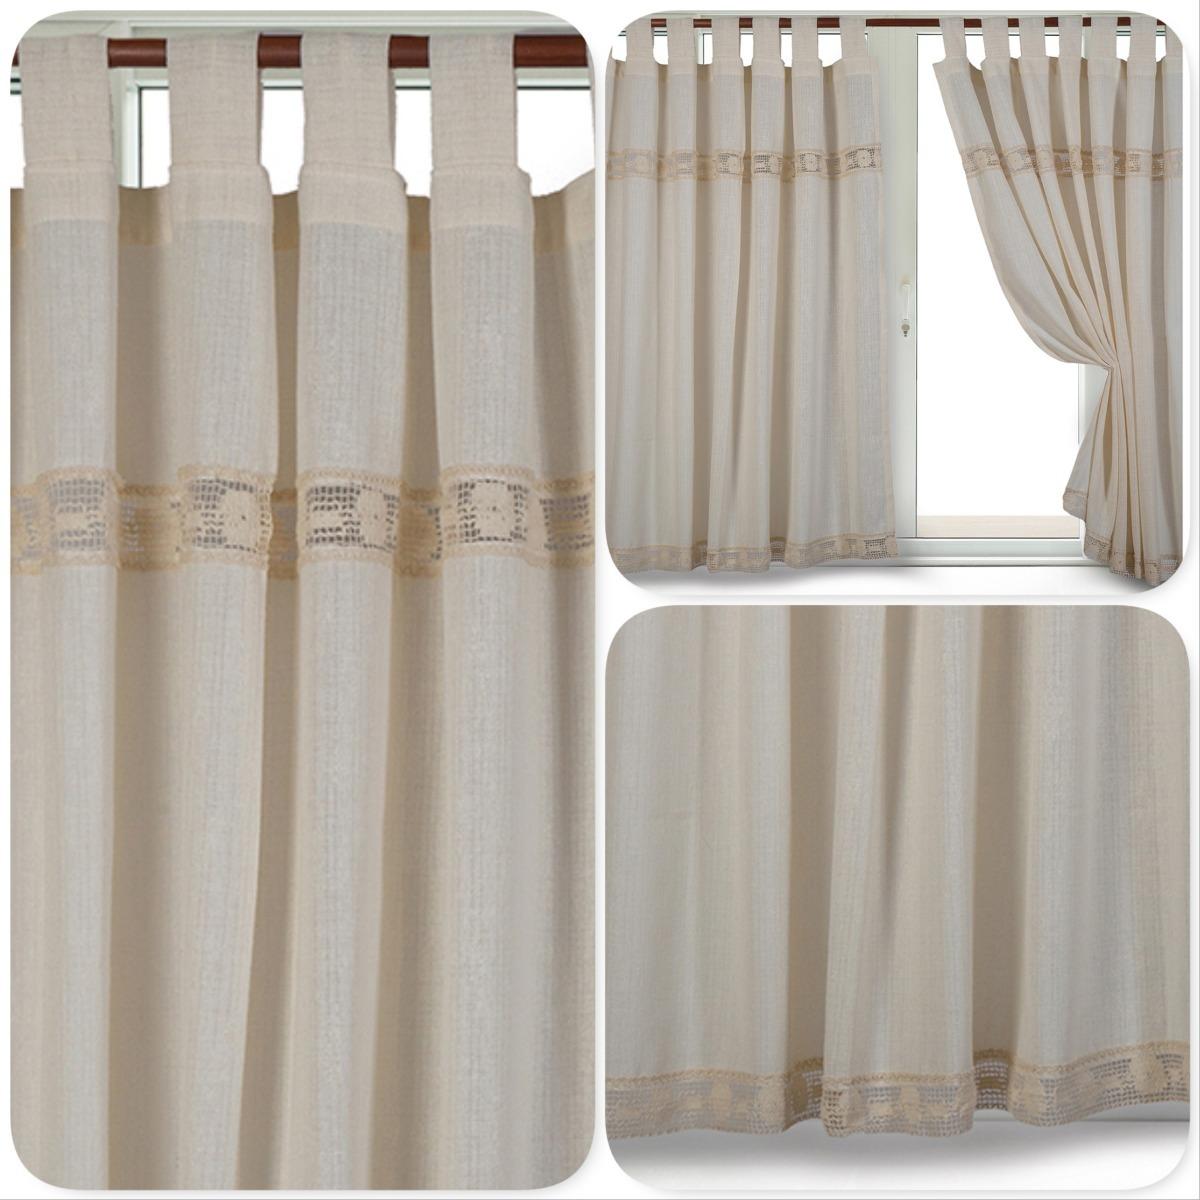 Modelos de cortinas de tela rusticas iratu - Telas rusticas para cortinas ...